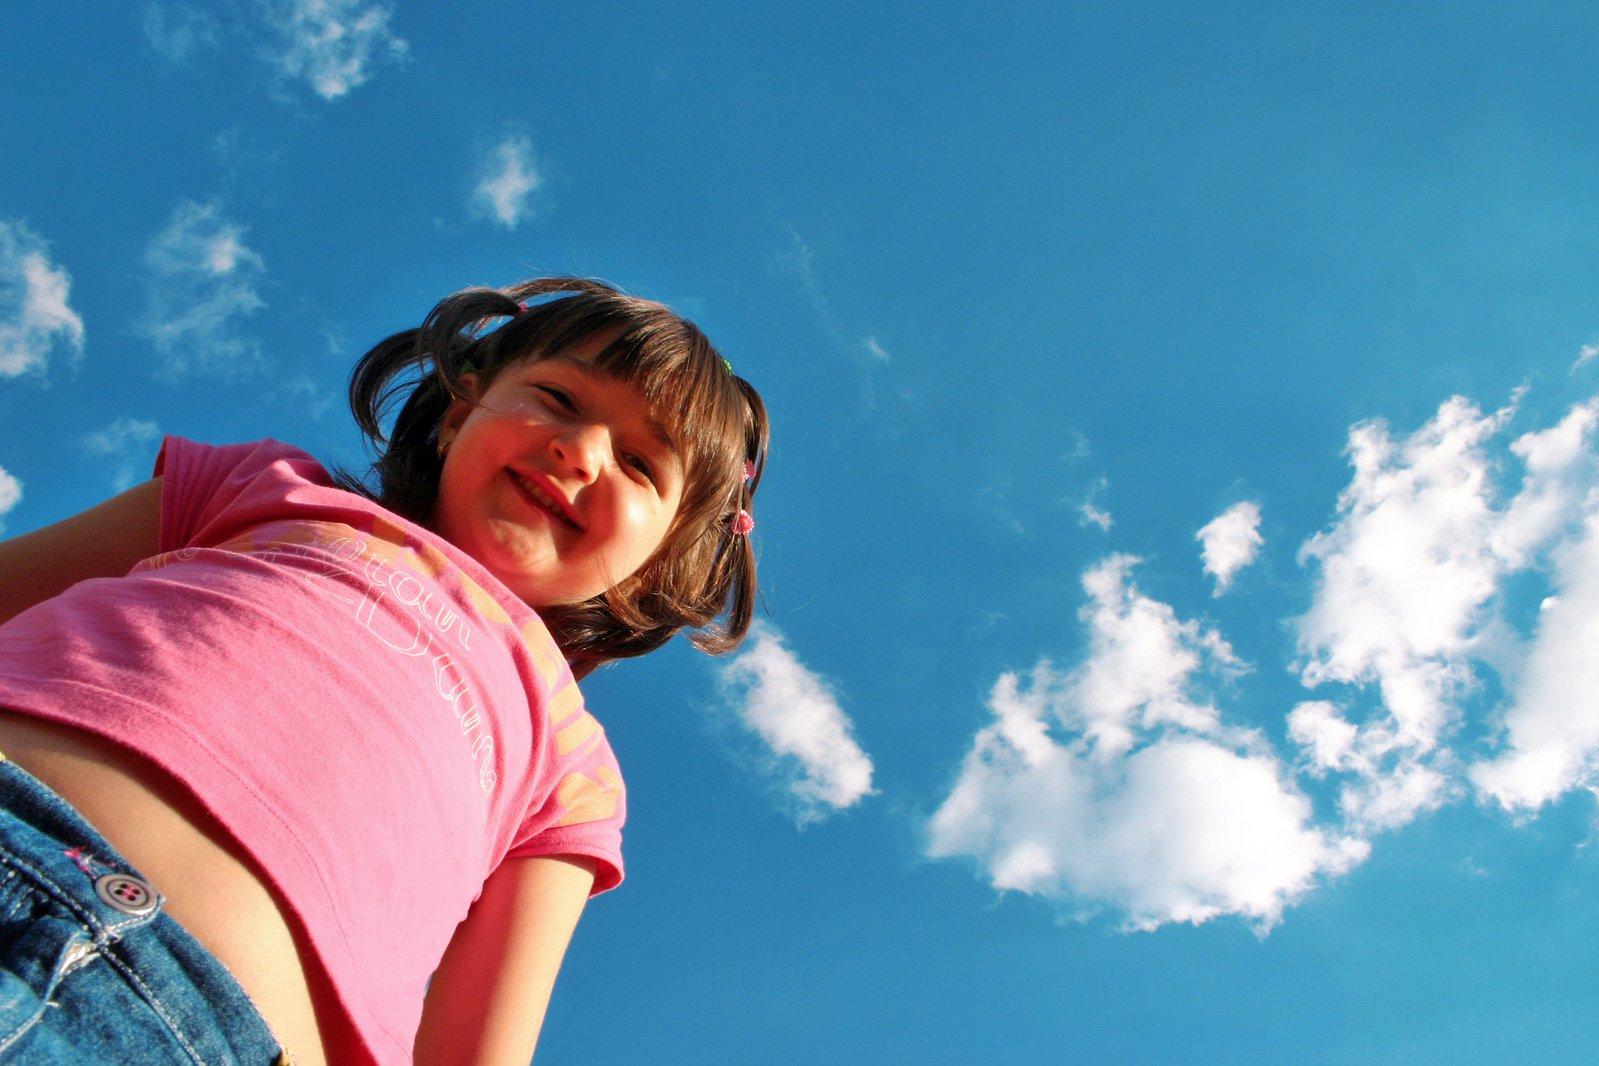 Maia,child,girl,smile